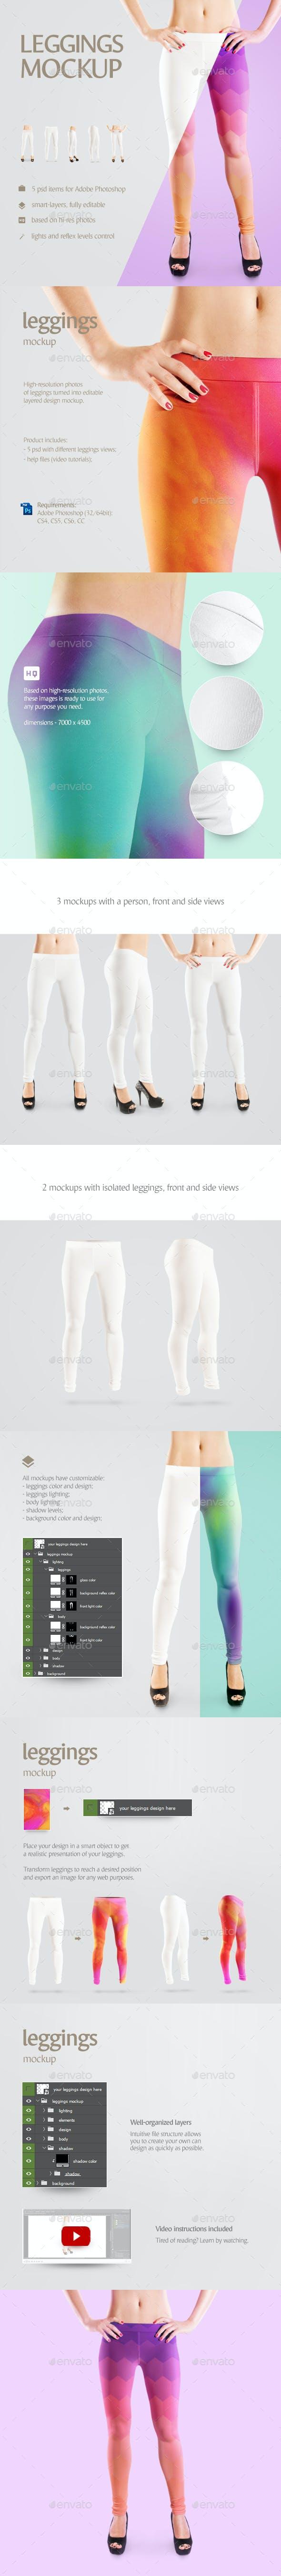 leggings mockup by rebrandy graphicriver